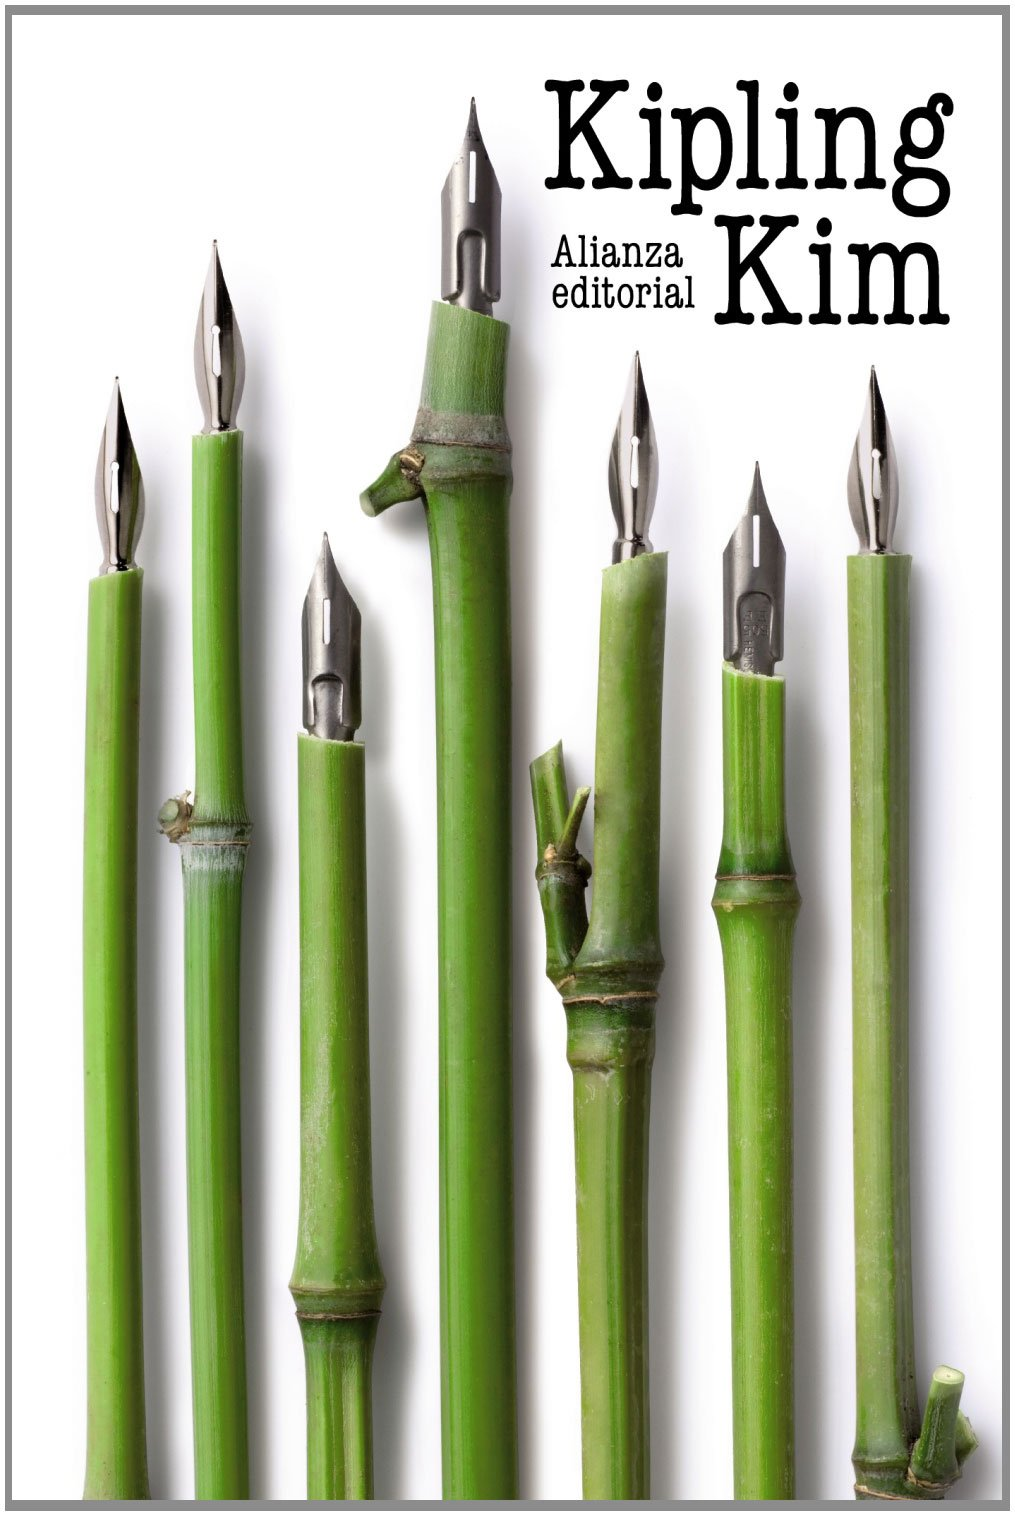 Kim (El Libro De Bolsillo - Bibliotecas De Autor - Biblioteca Kipling) Tapa blanda – 3 abr 2012 Rudyard Kipling José Luis López Muñoz Alianza 8420669776